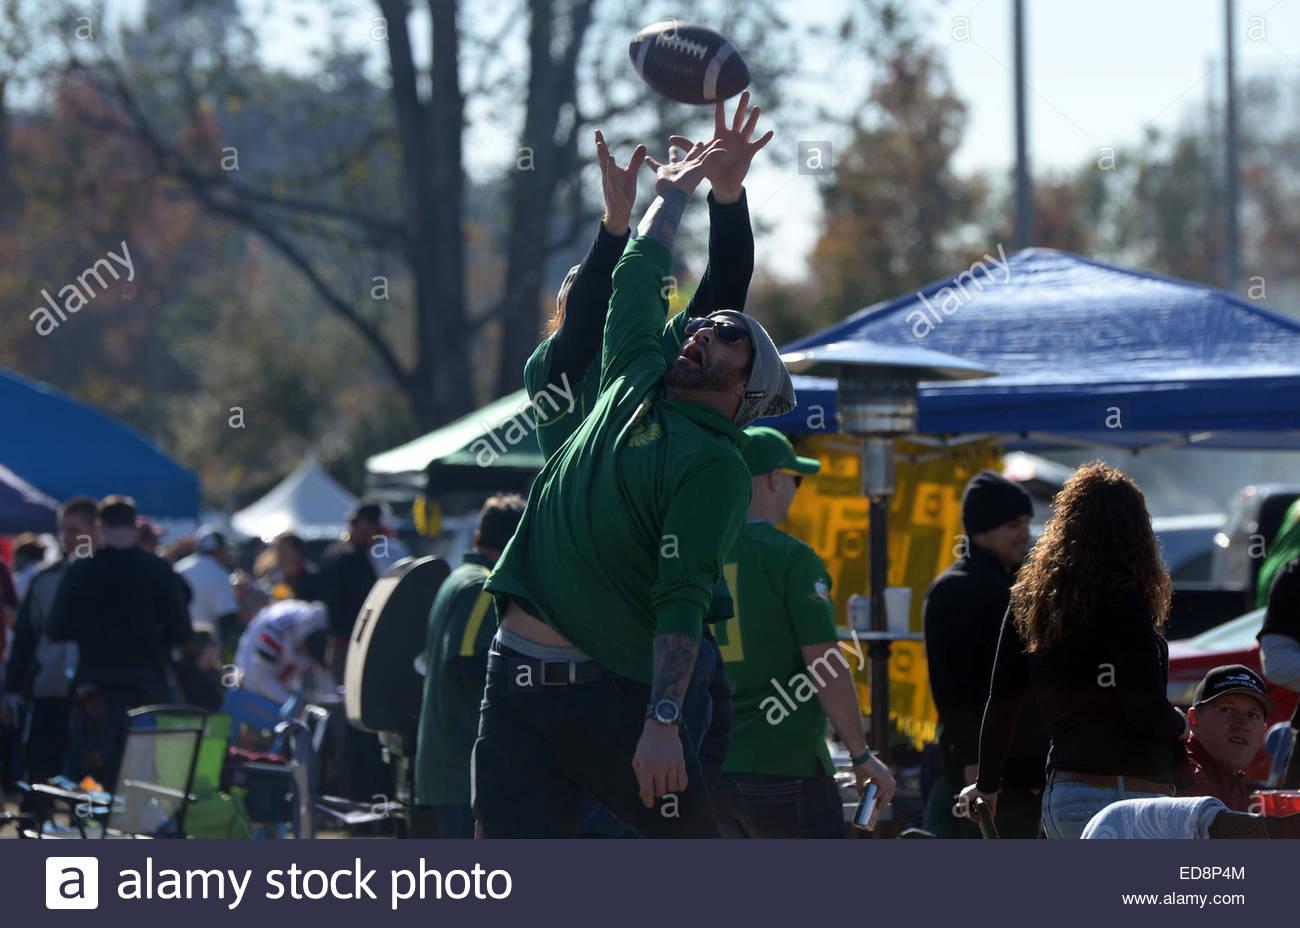 Pasadena, California, USA. 01st Jan, 2015. Oregon Ducks fans Danny Donadio, right, reaches for a football in front - Stock Image